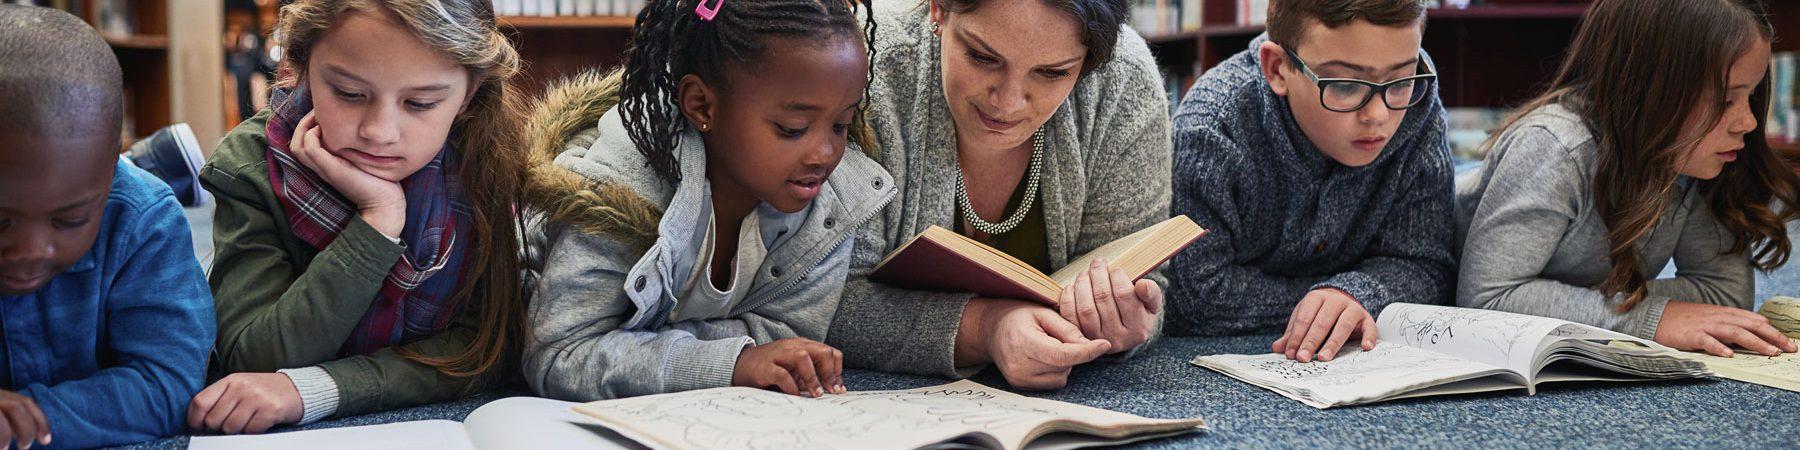 Bilingual Learners Graduate Certificate Program Online at UConn Neag School of Education - Educator teaching in a bilingual learner setting.